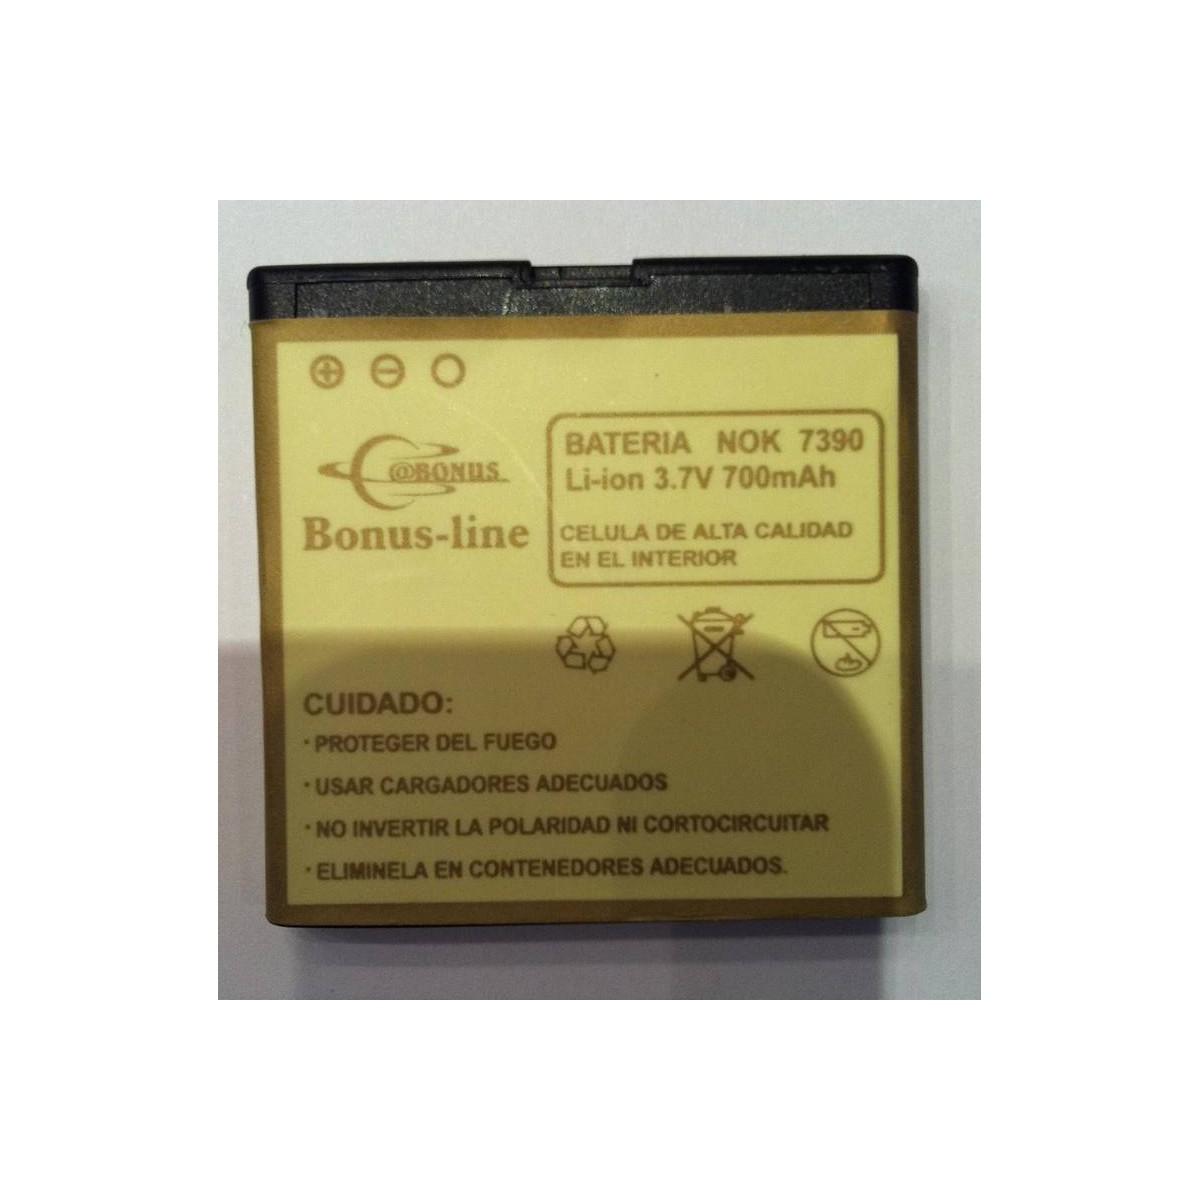 Batería BP-5M 5610, 5700, 6110, 6500s, 7390, 8600 700 m/AH Li-ion Larga Duracion